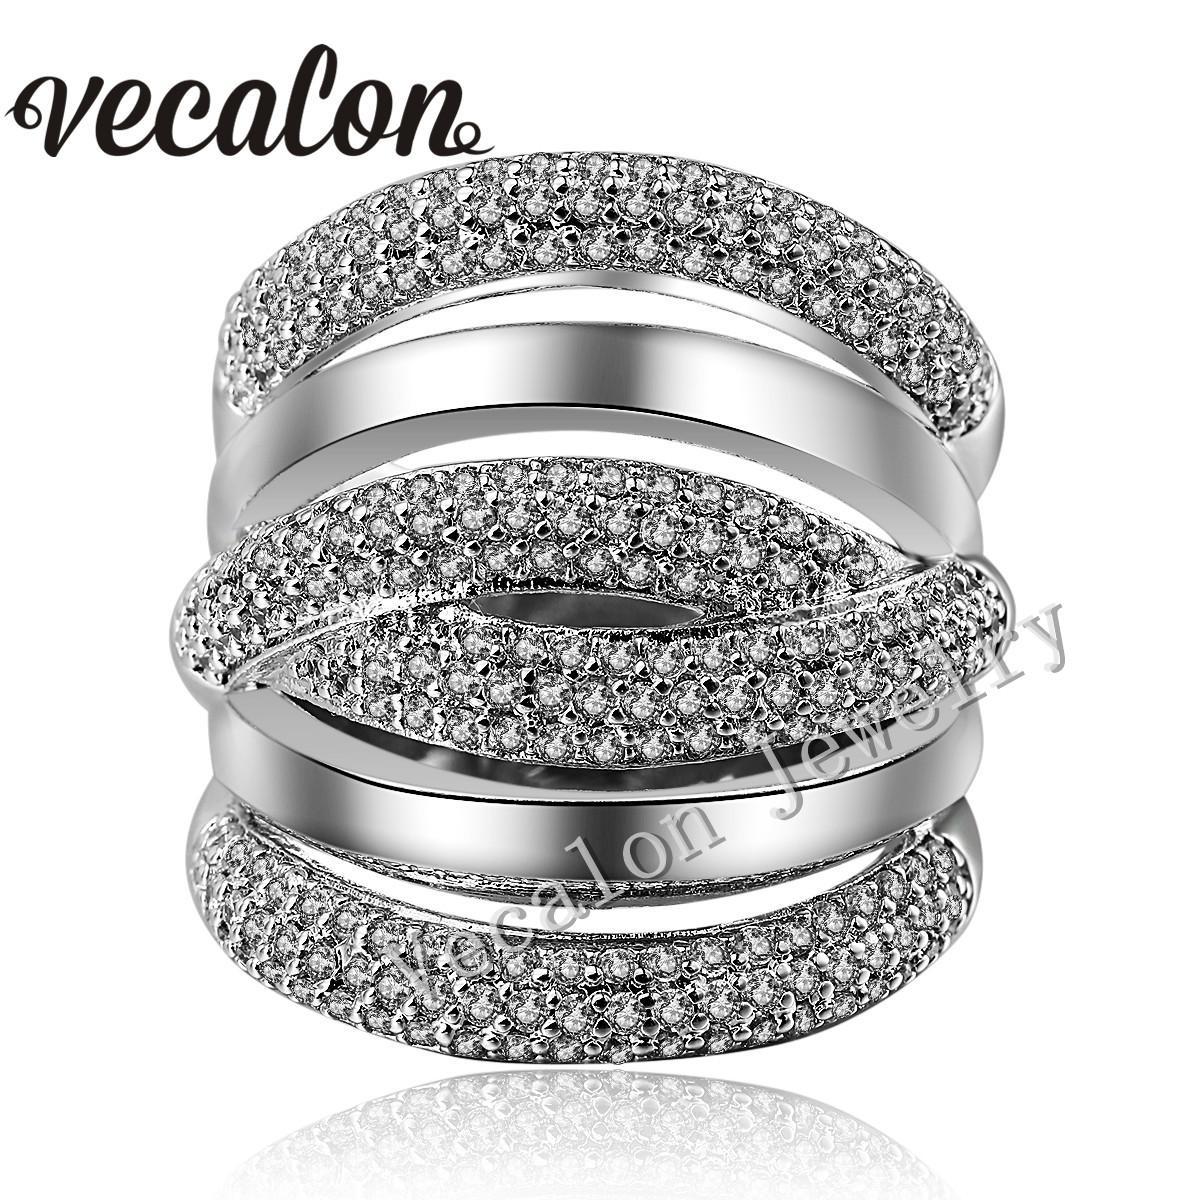 Vecalon 포장 세트 234pcs 토파즈 시뮬레이션 된 다이아몬드 Cz 크로스 약혼 결혼 반지 여자 14KT 화이트 골드 채워진 여성 밴드 반지